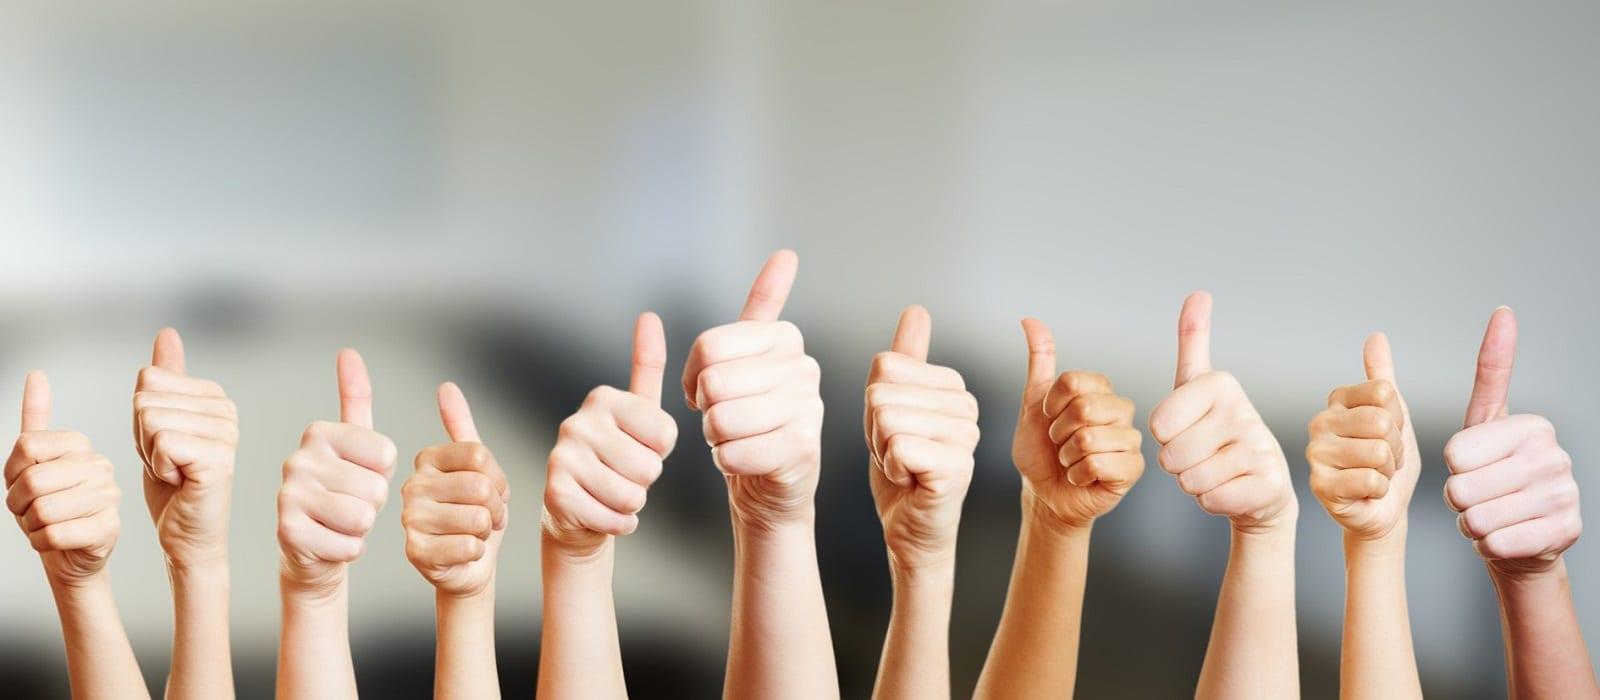 thumbsup-reputation-customer-satisfaction-award-image-2